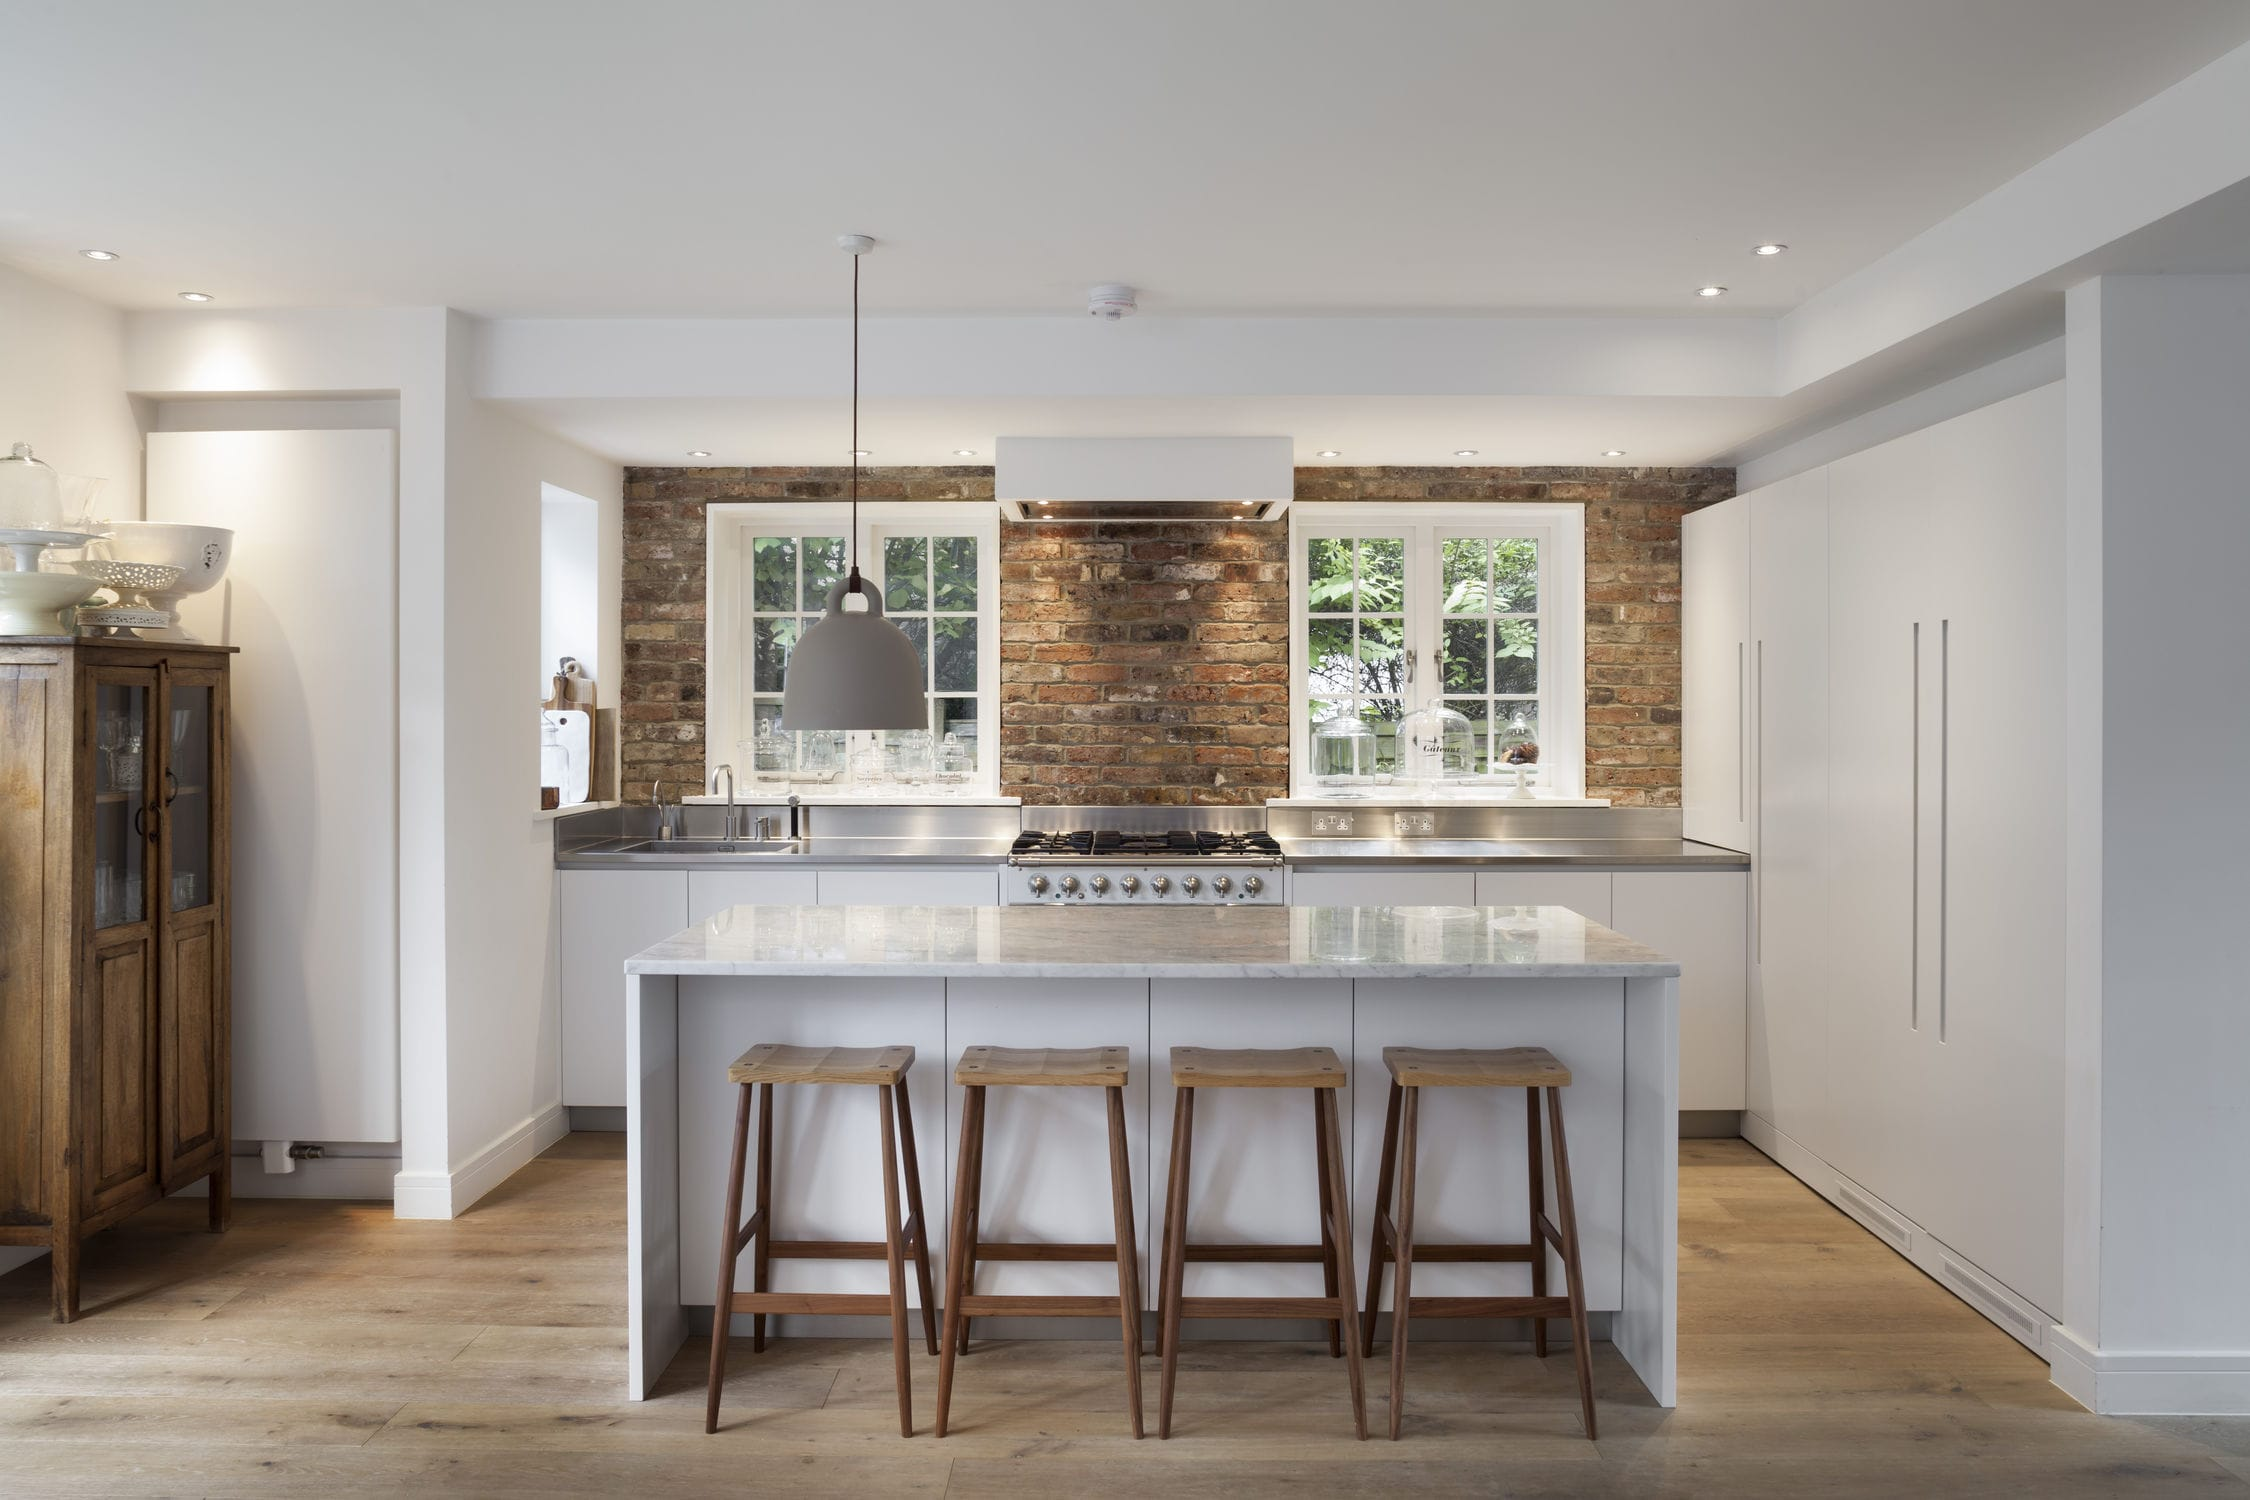 Cucina moderna / in pietra / con isola / senza maniglie - 201311 ...